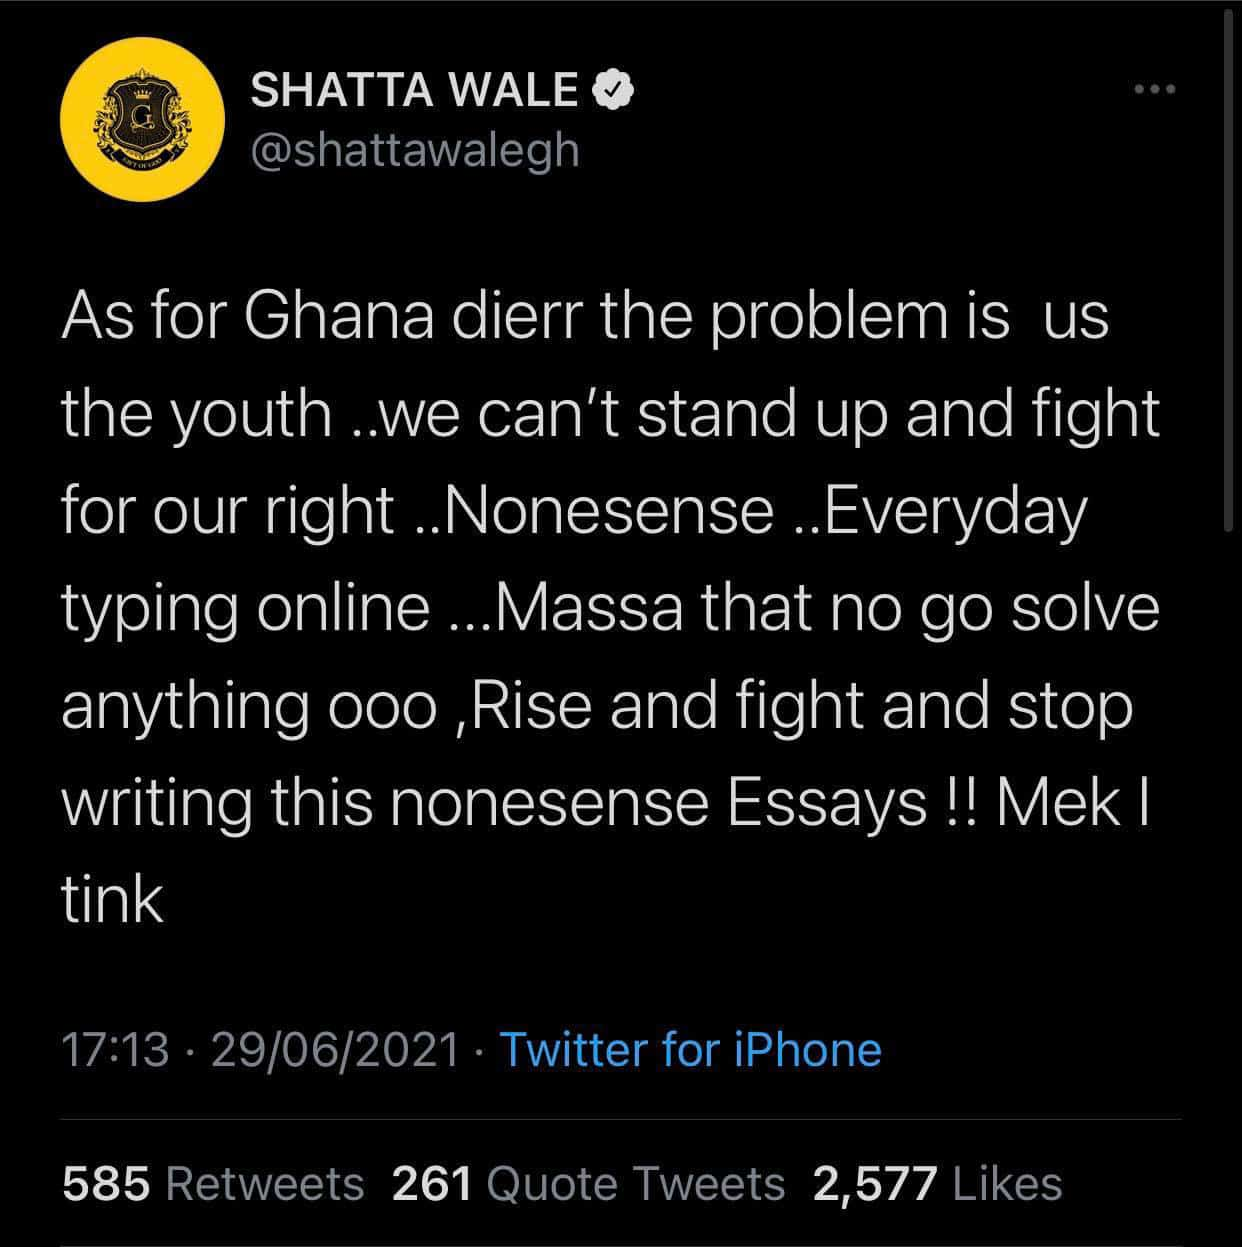 Shatta Wale speaks on #FixTheCountry